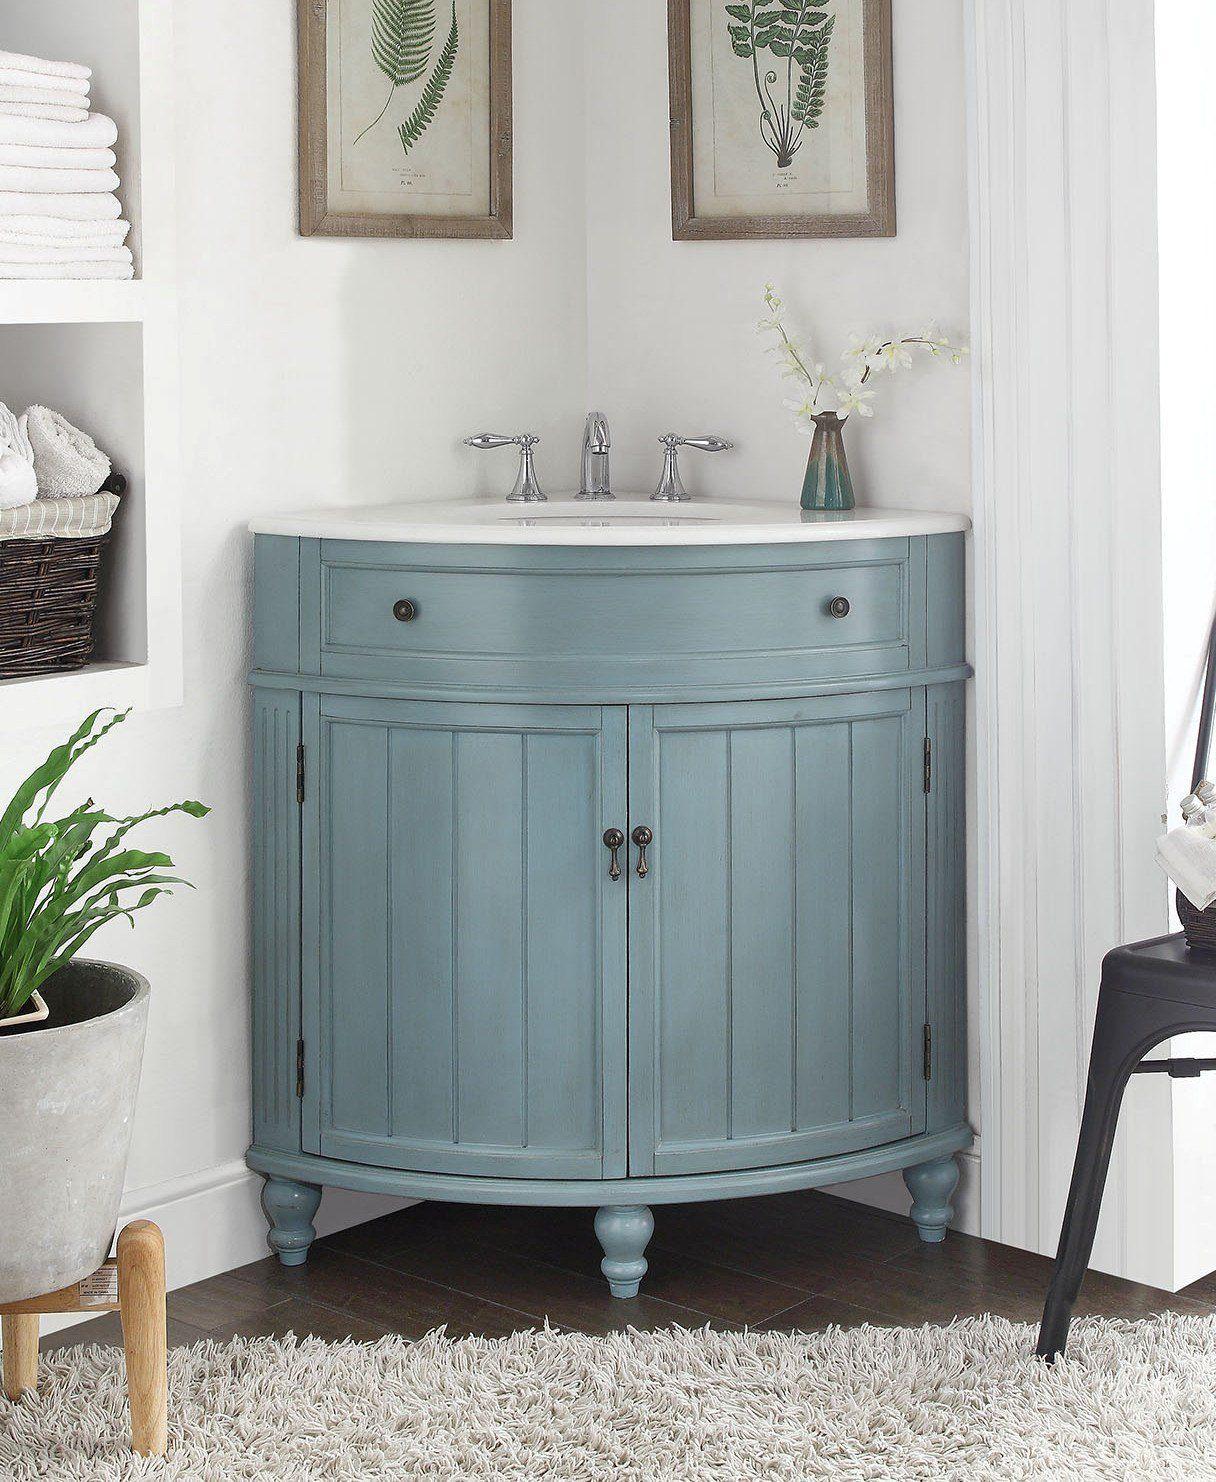 24 Vintage Light Blue Cottage Style Thomasville Bathroom Sink Vanity Model Gd 47544bu